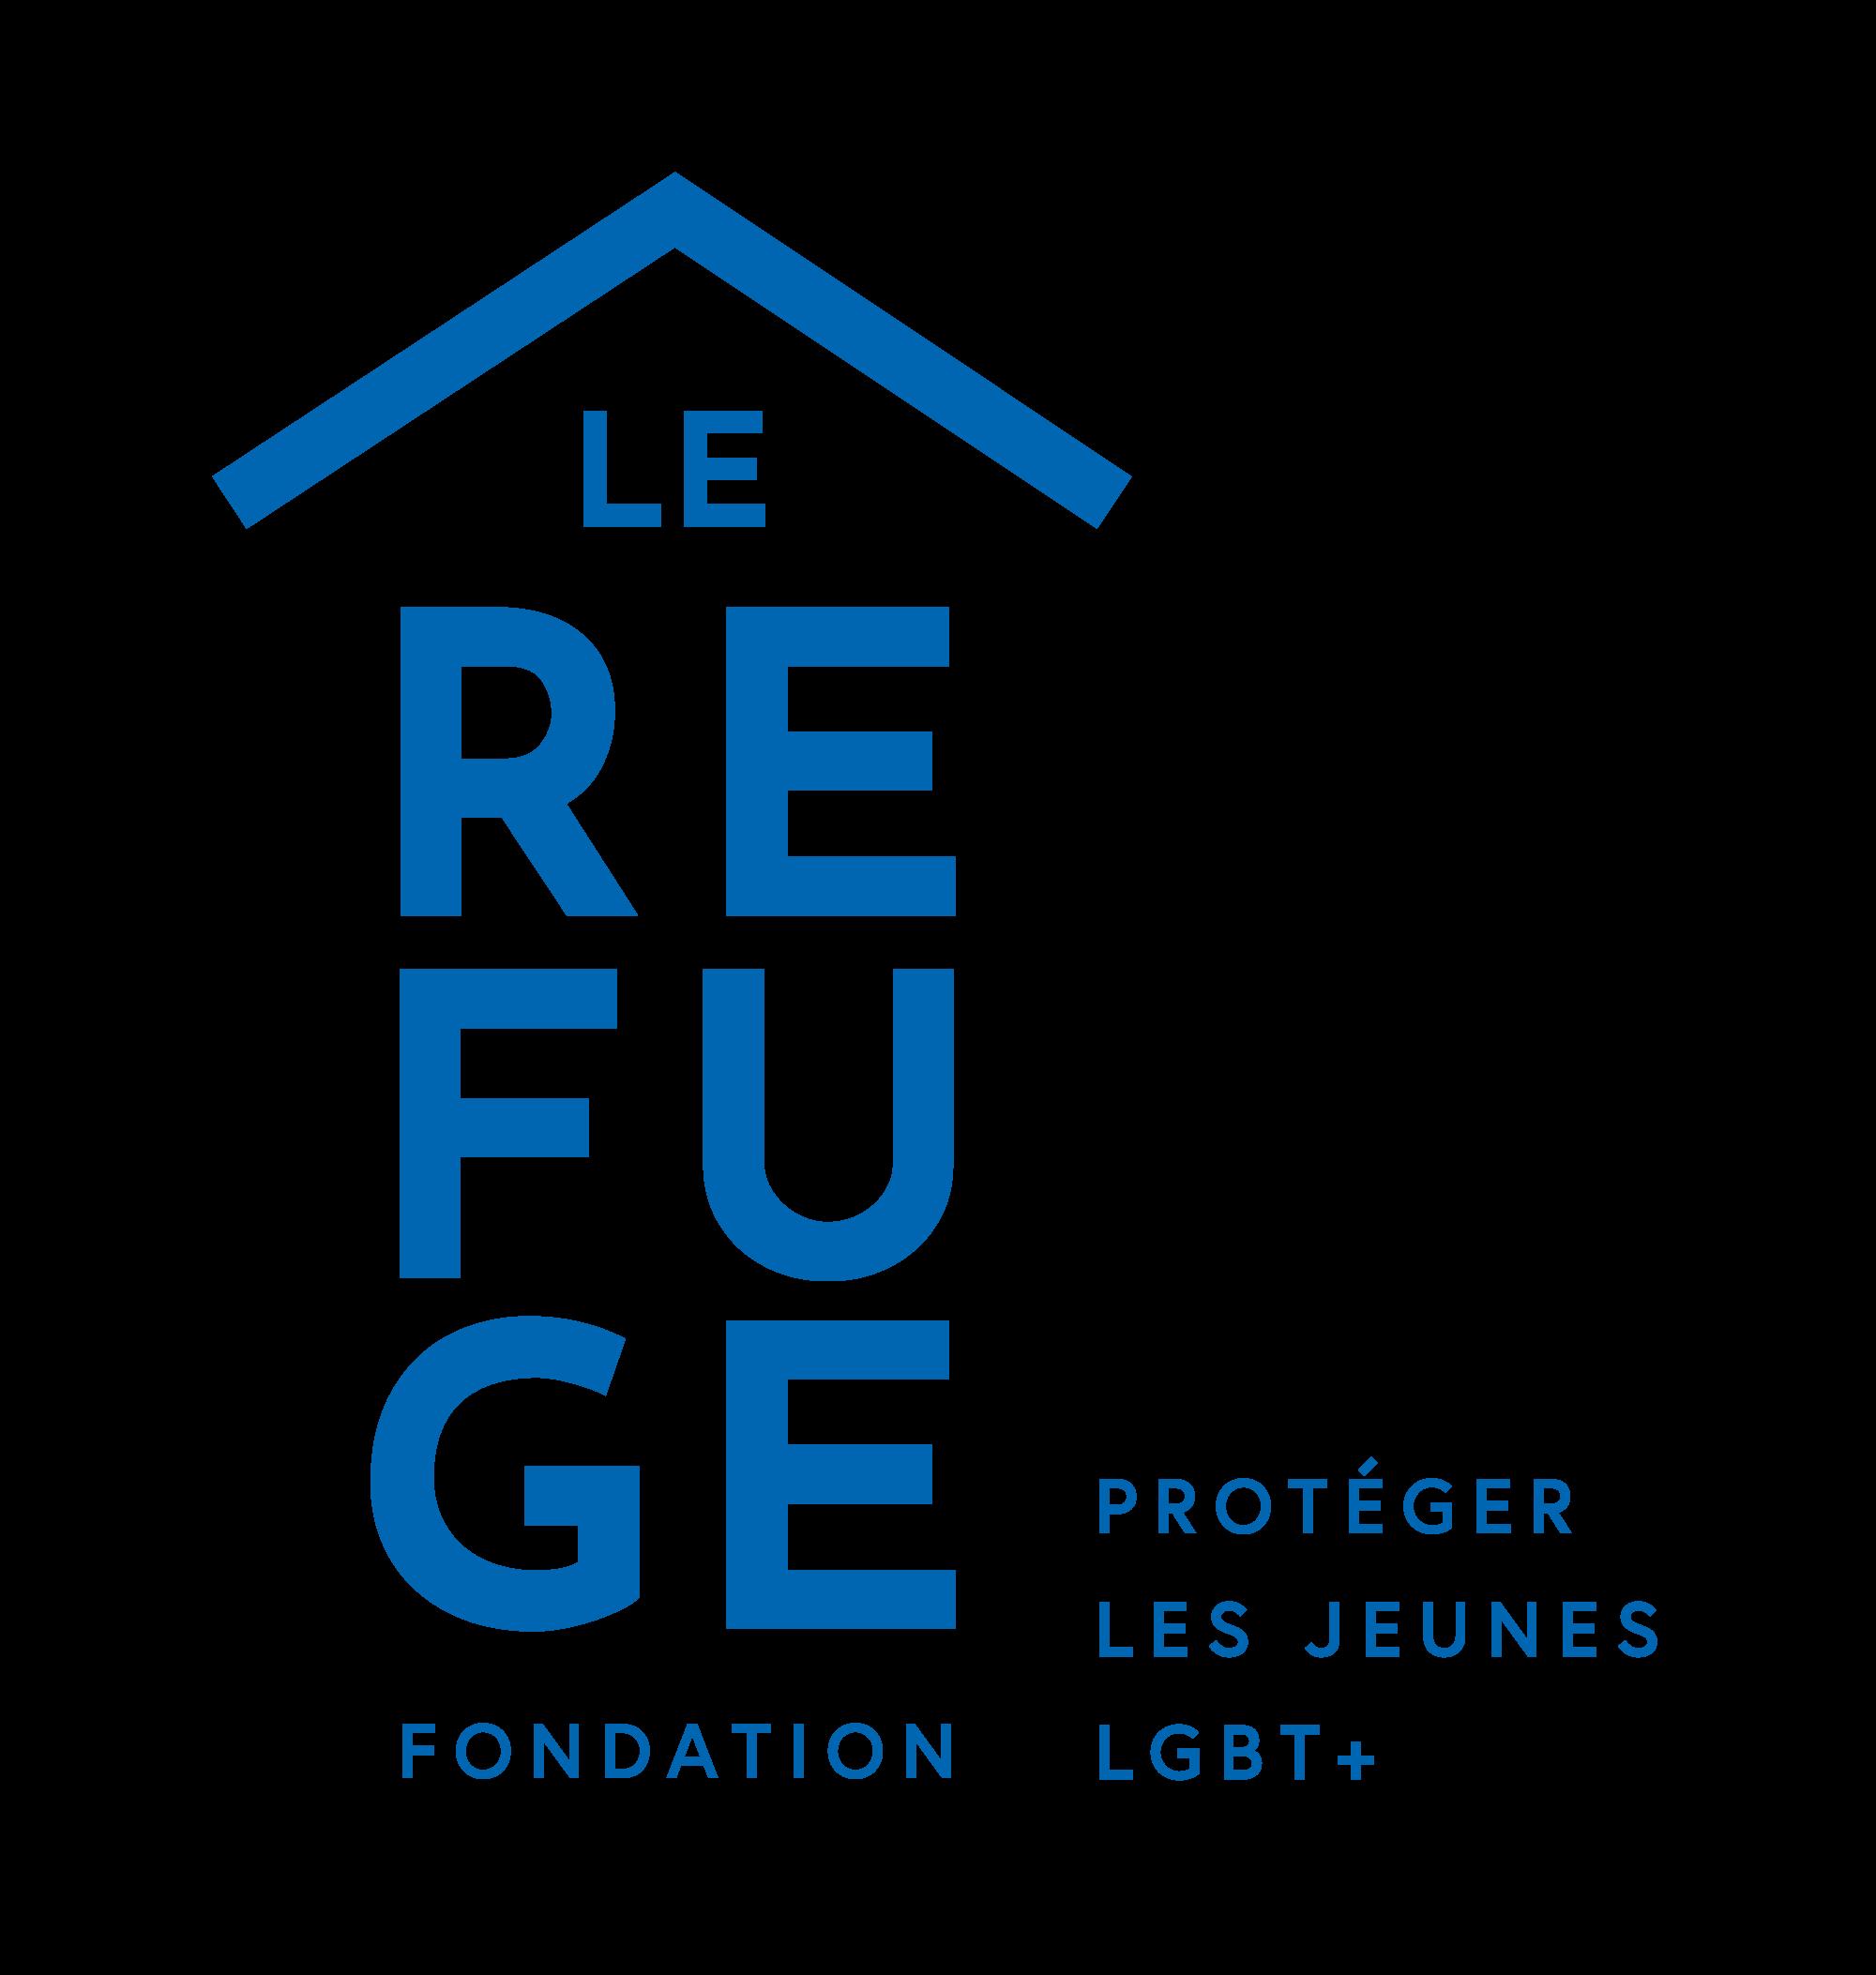 Logo Fondation Le Refuge